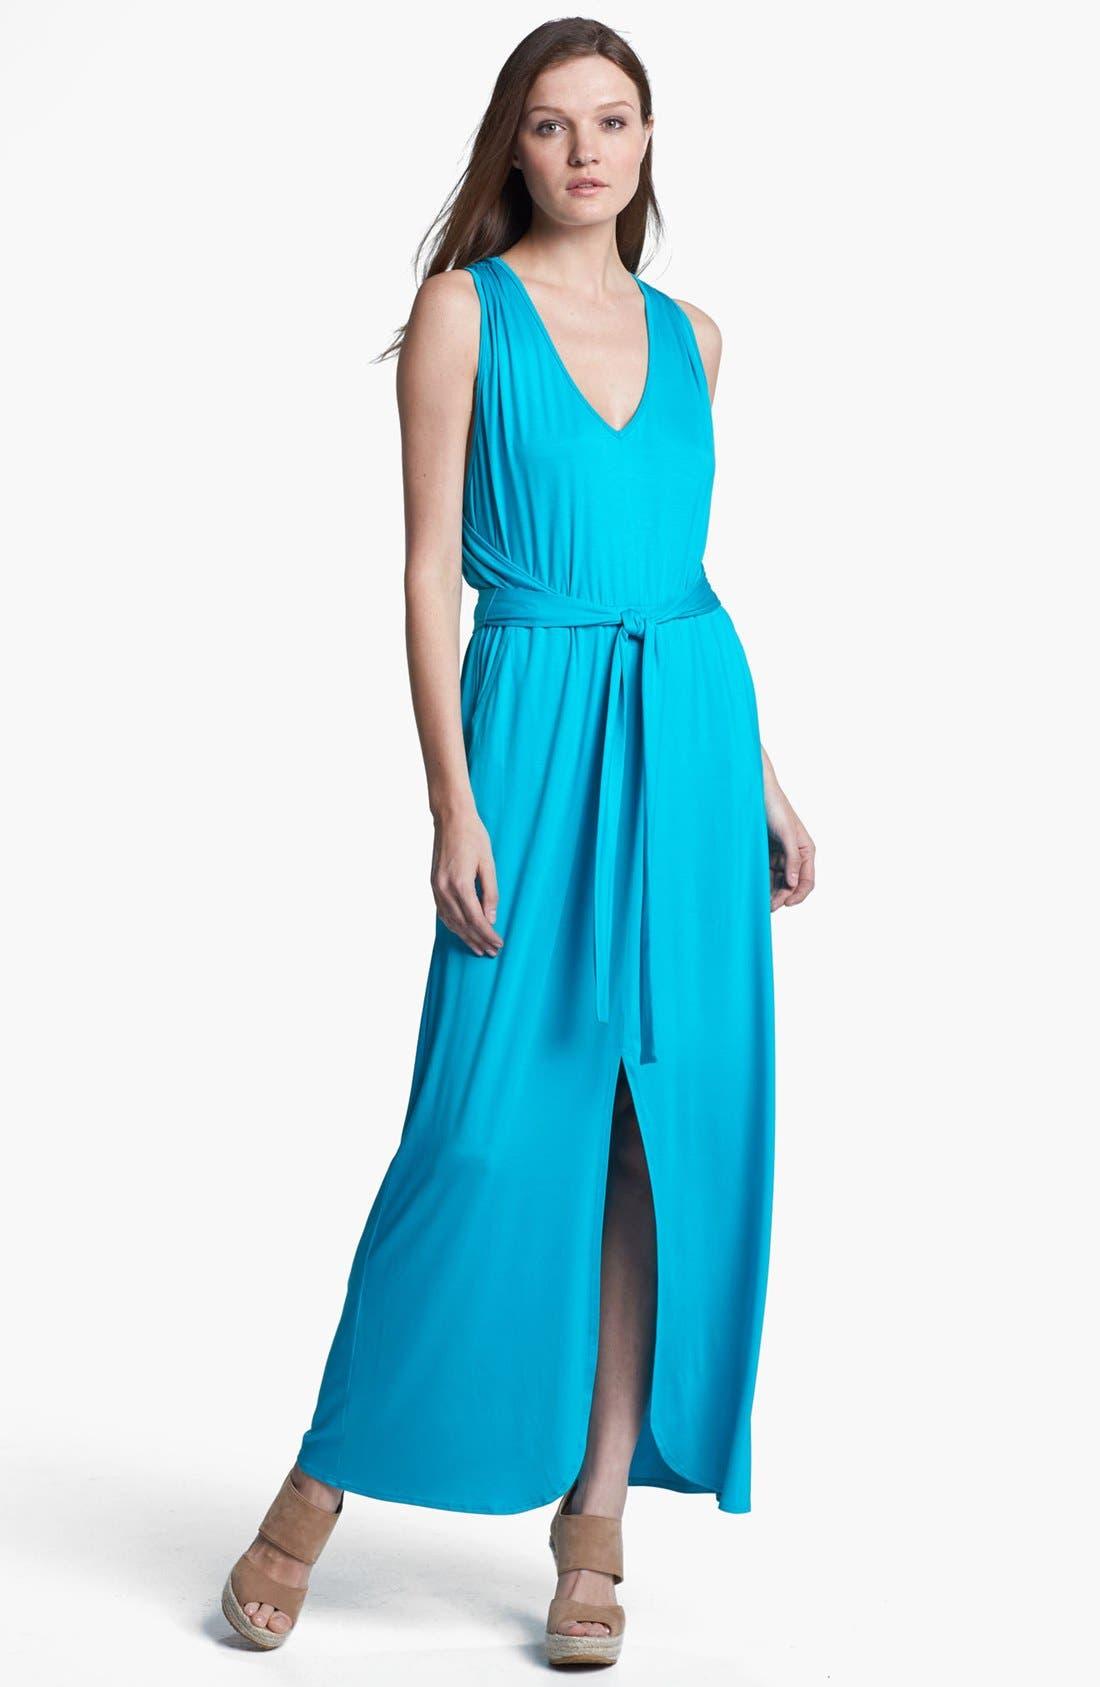 Main Image - Trina Turk 'Leandra' Belted Stretch Maxi Dress